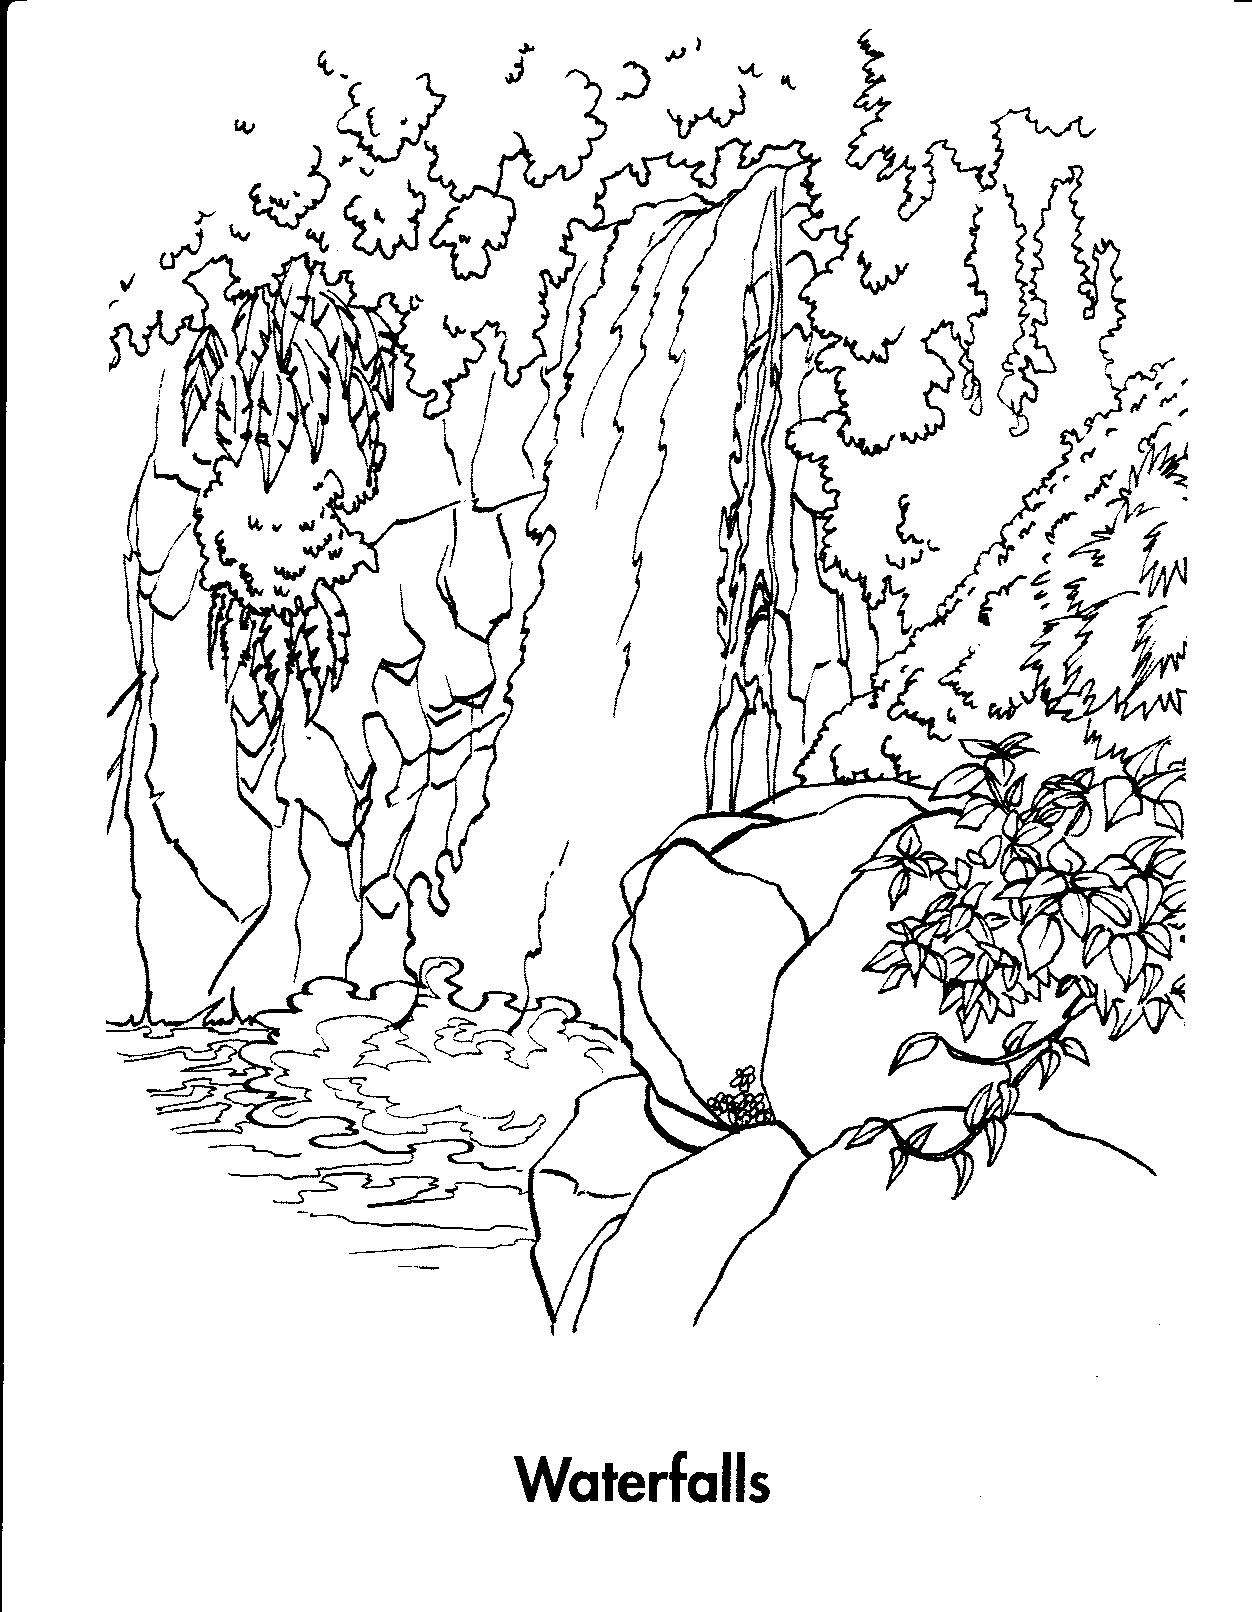 Niagara Falls Drawing at GetDrawings.com | Free for personal use ...